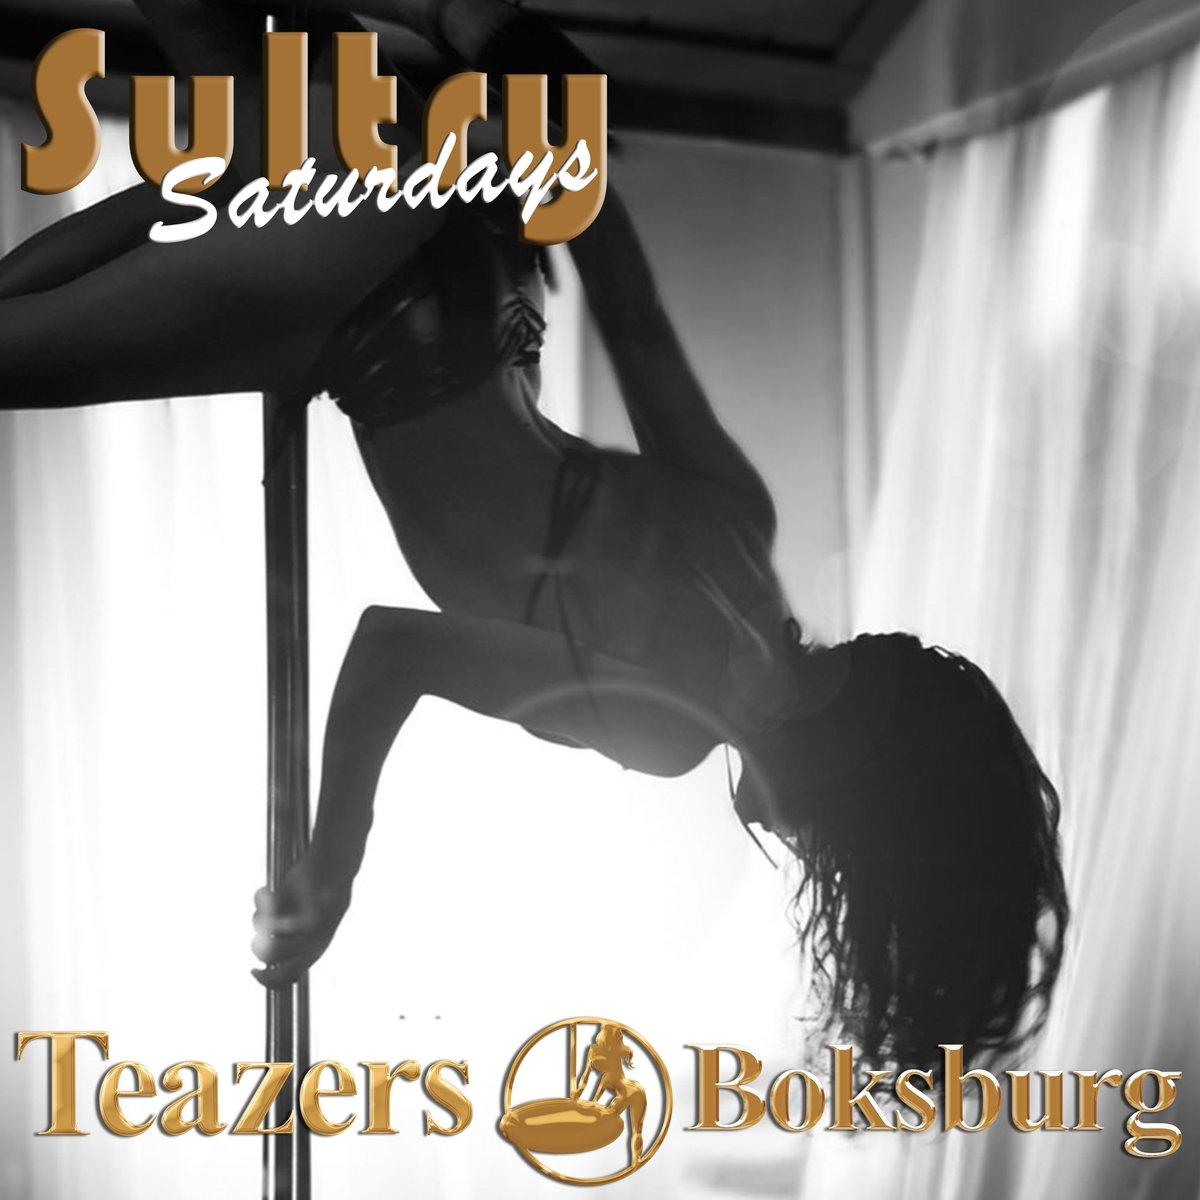 #Teazers_Boksburg It`s a #Sultry Saturday Night @BoksburgTeazers  Doors Open 8pm Till 4am  #HOT #Seductive New Dancers for your Entertainment Call: 011 892 4904 #Johannesburg #Gauteng #Boksburg